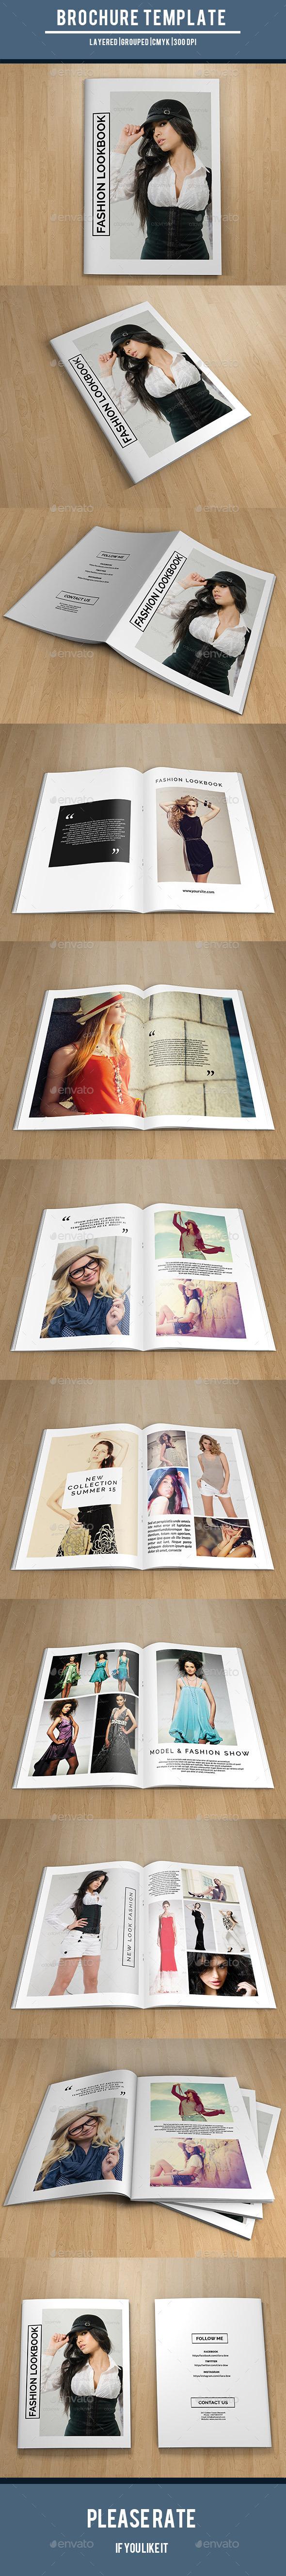 Fashion Lookbook-V202 - Corporate Brochures